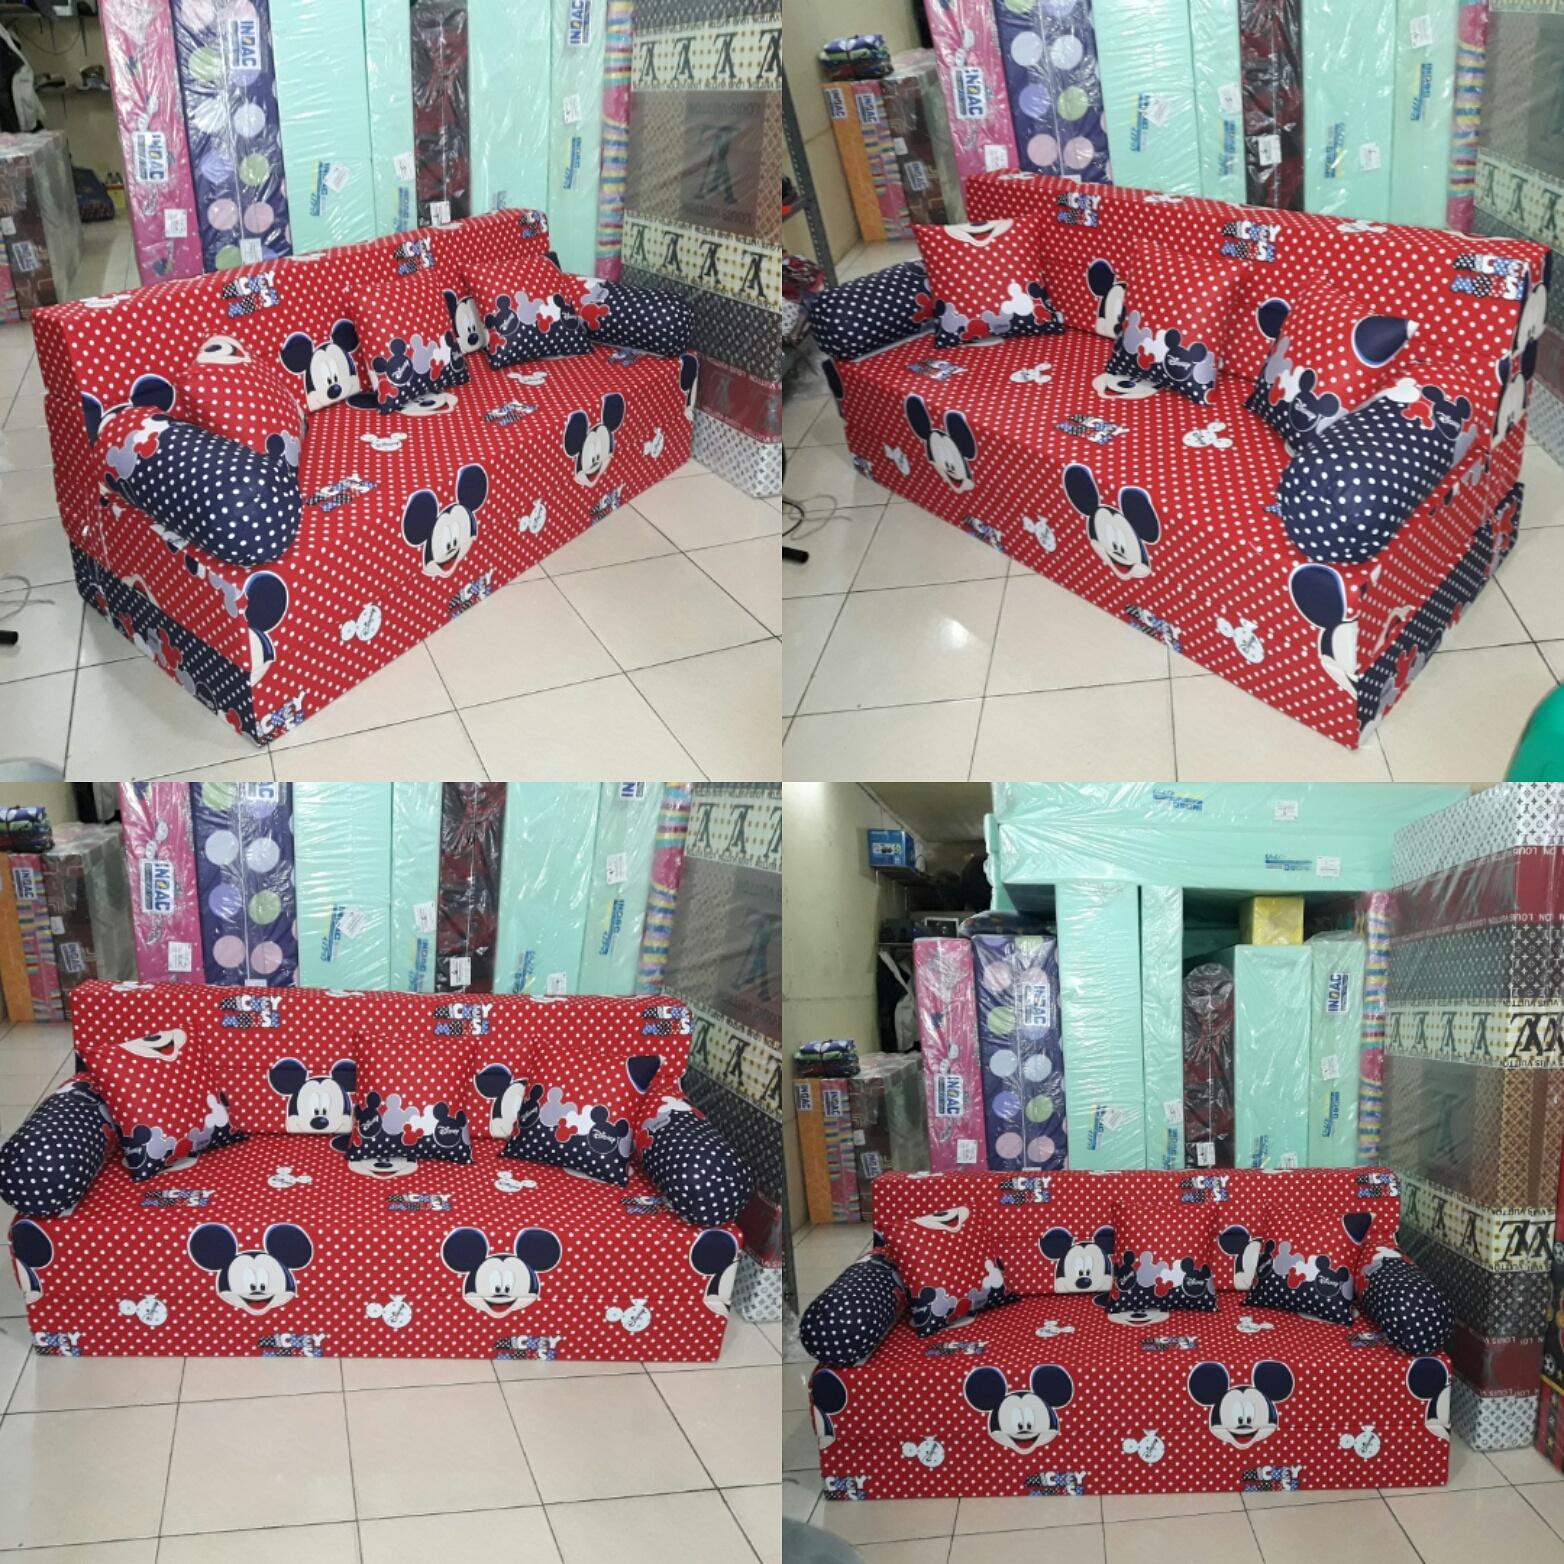 harga cover sofa bed inoac baby couches sofas kasur lipat agen resmi motif terbaru 2016